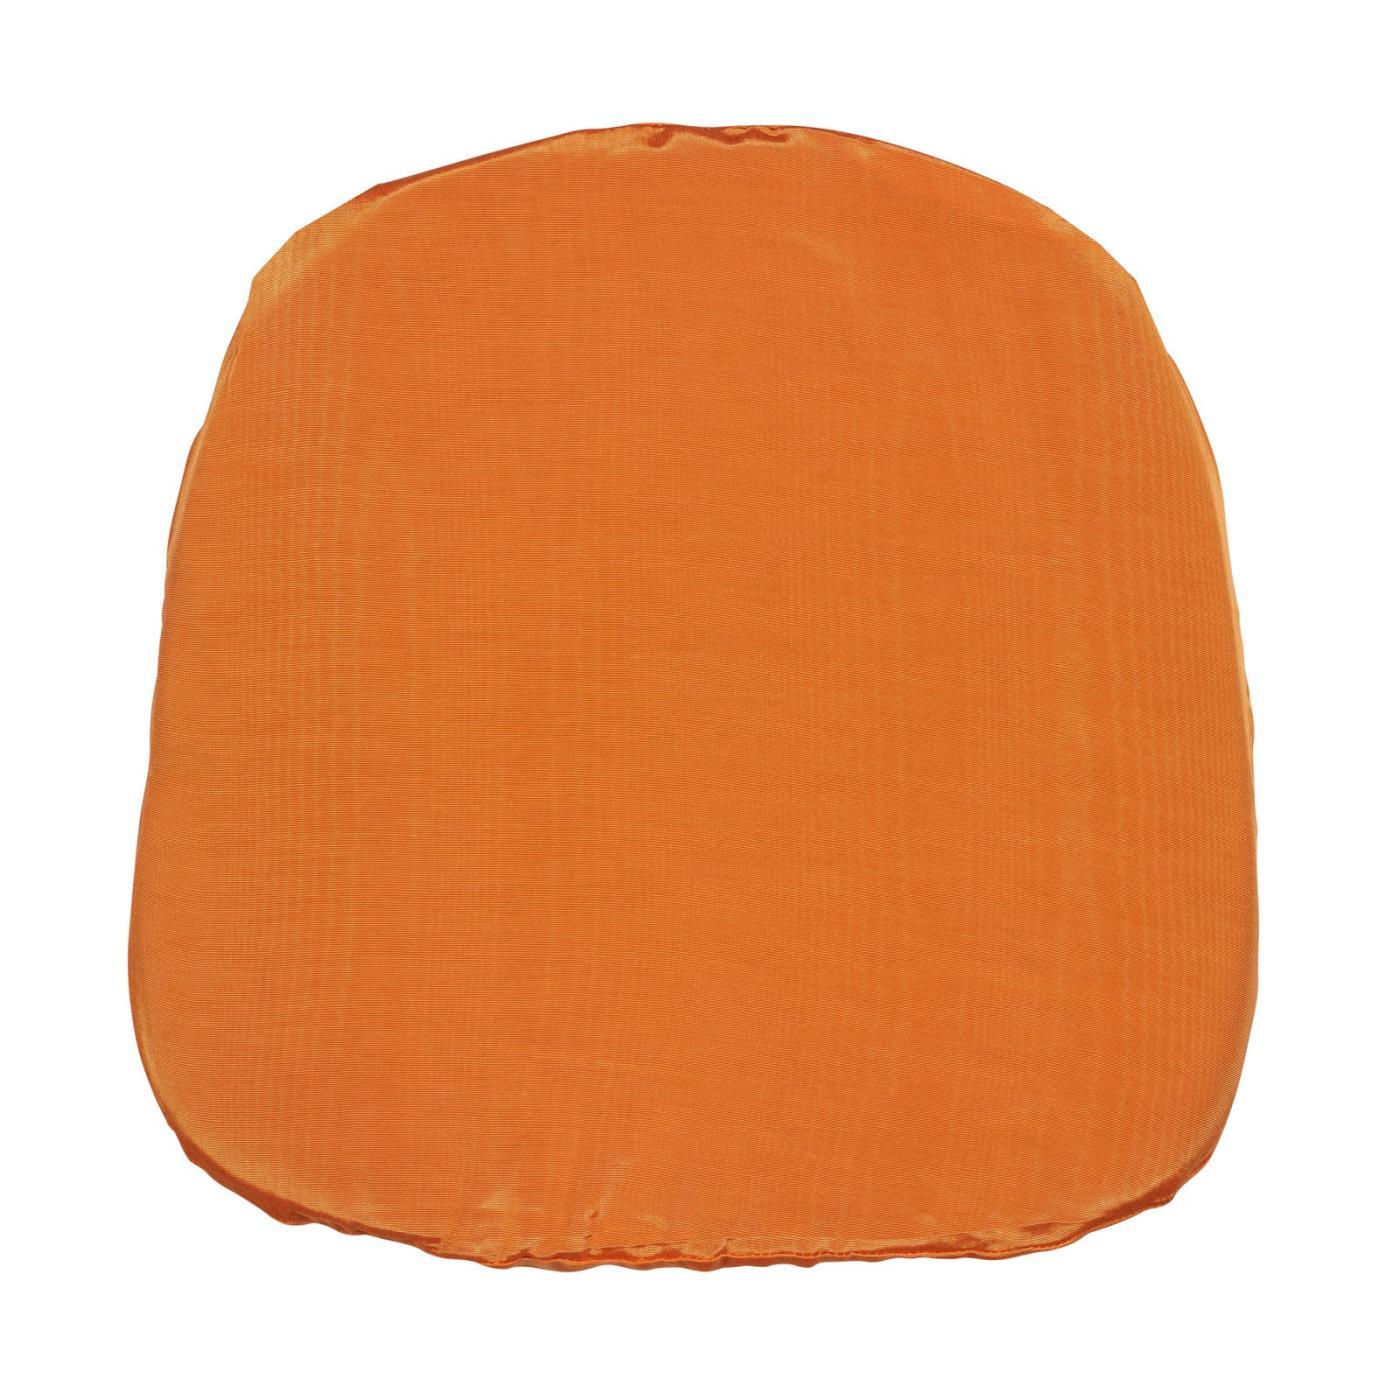 Bengaline Moire Seat Cushion - Mango